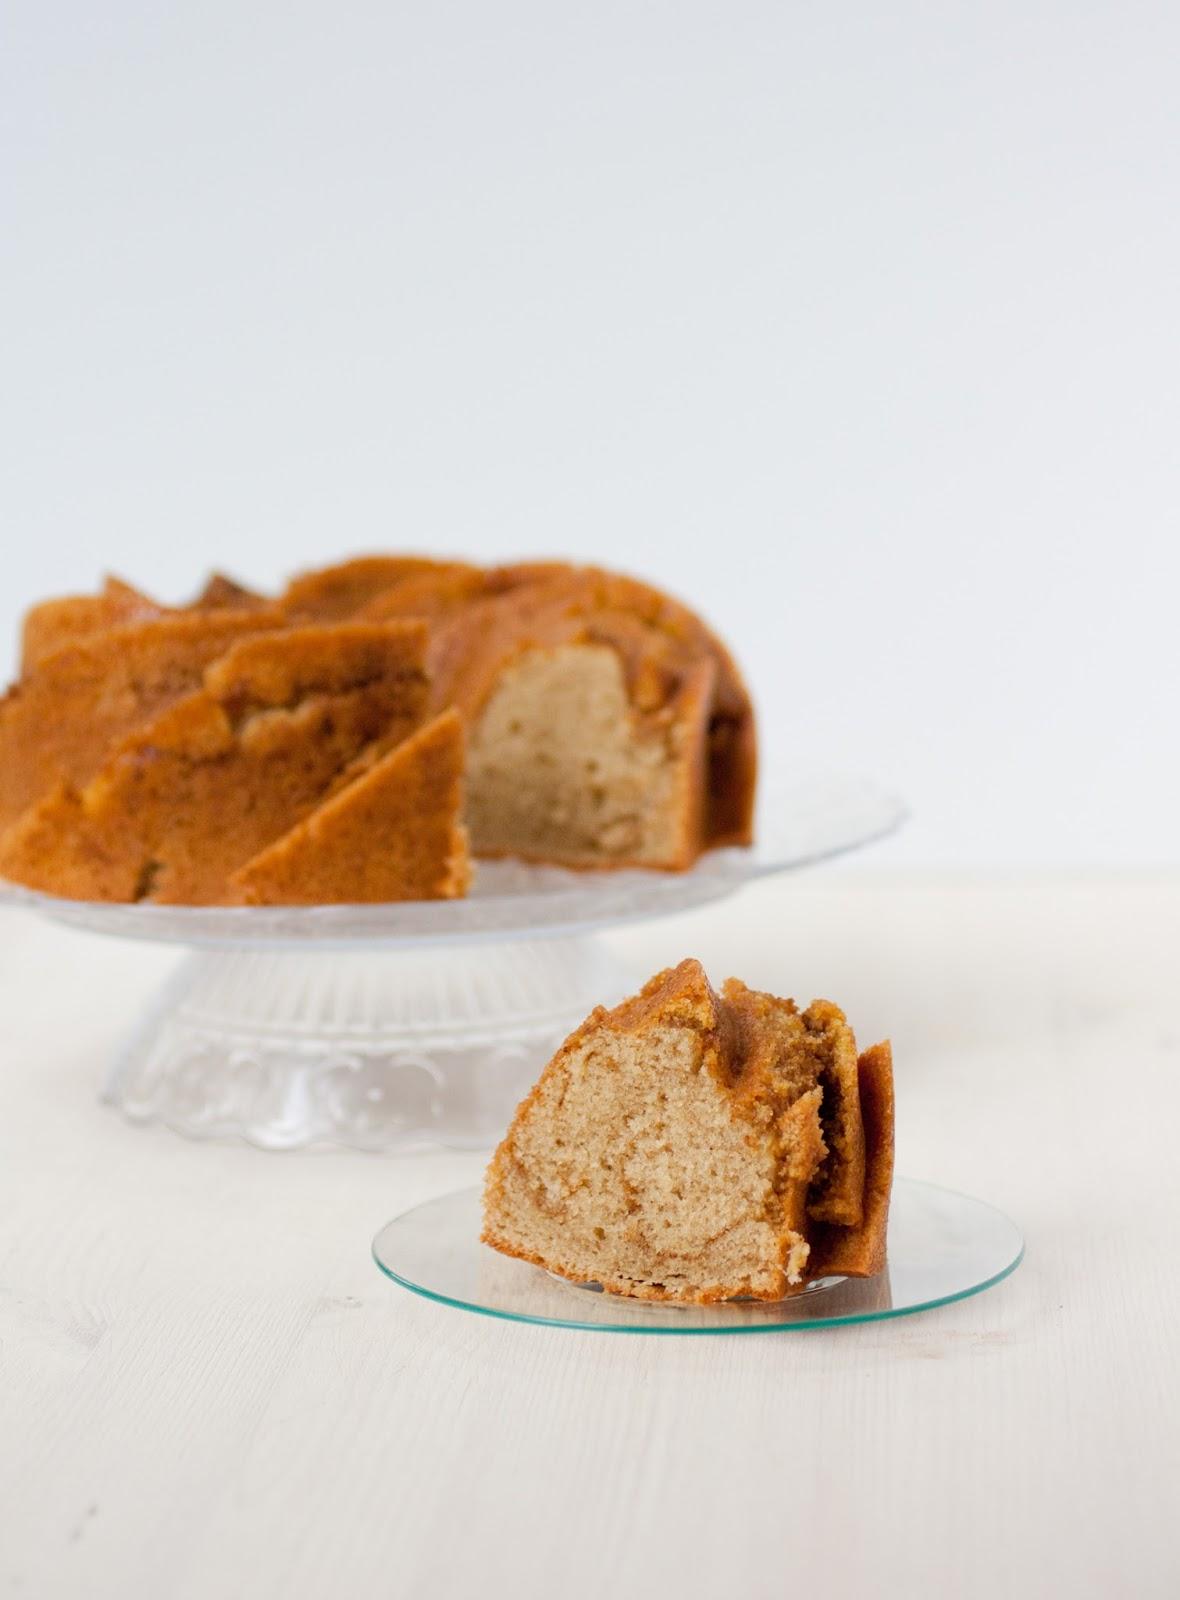 Spiced-Bundt-Cake-5.jpg